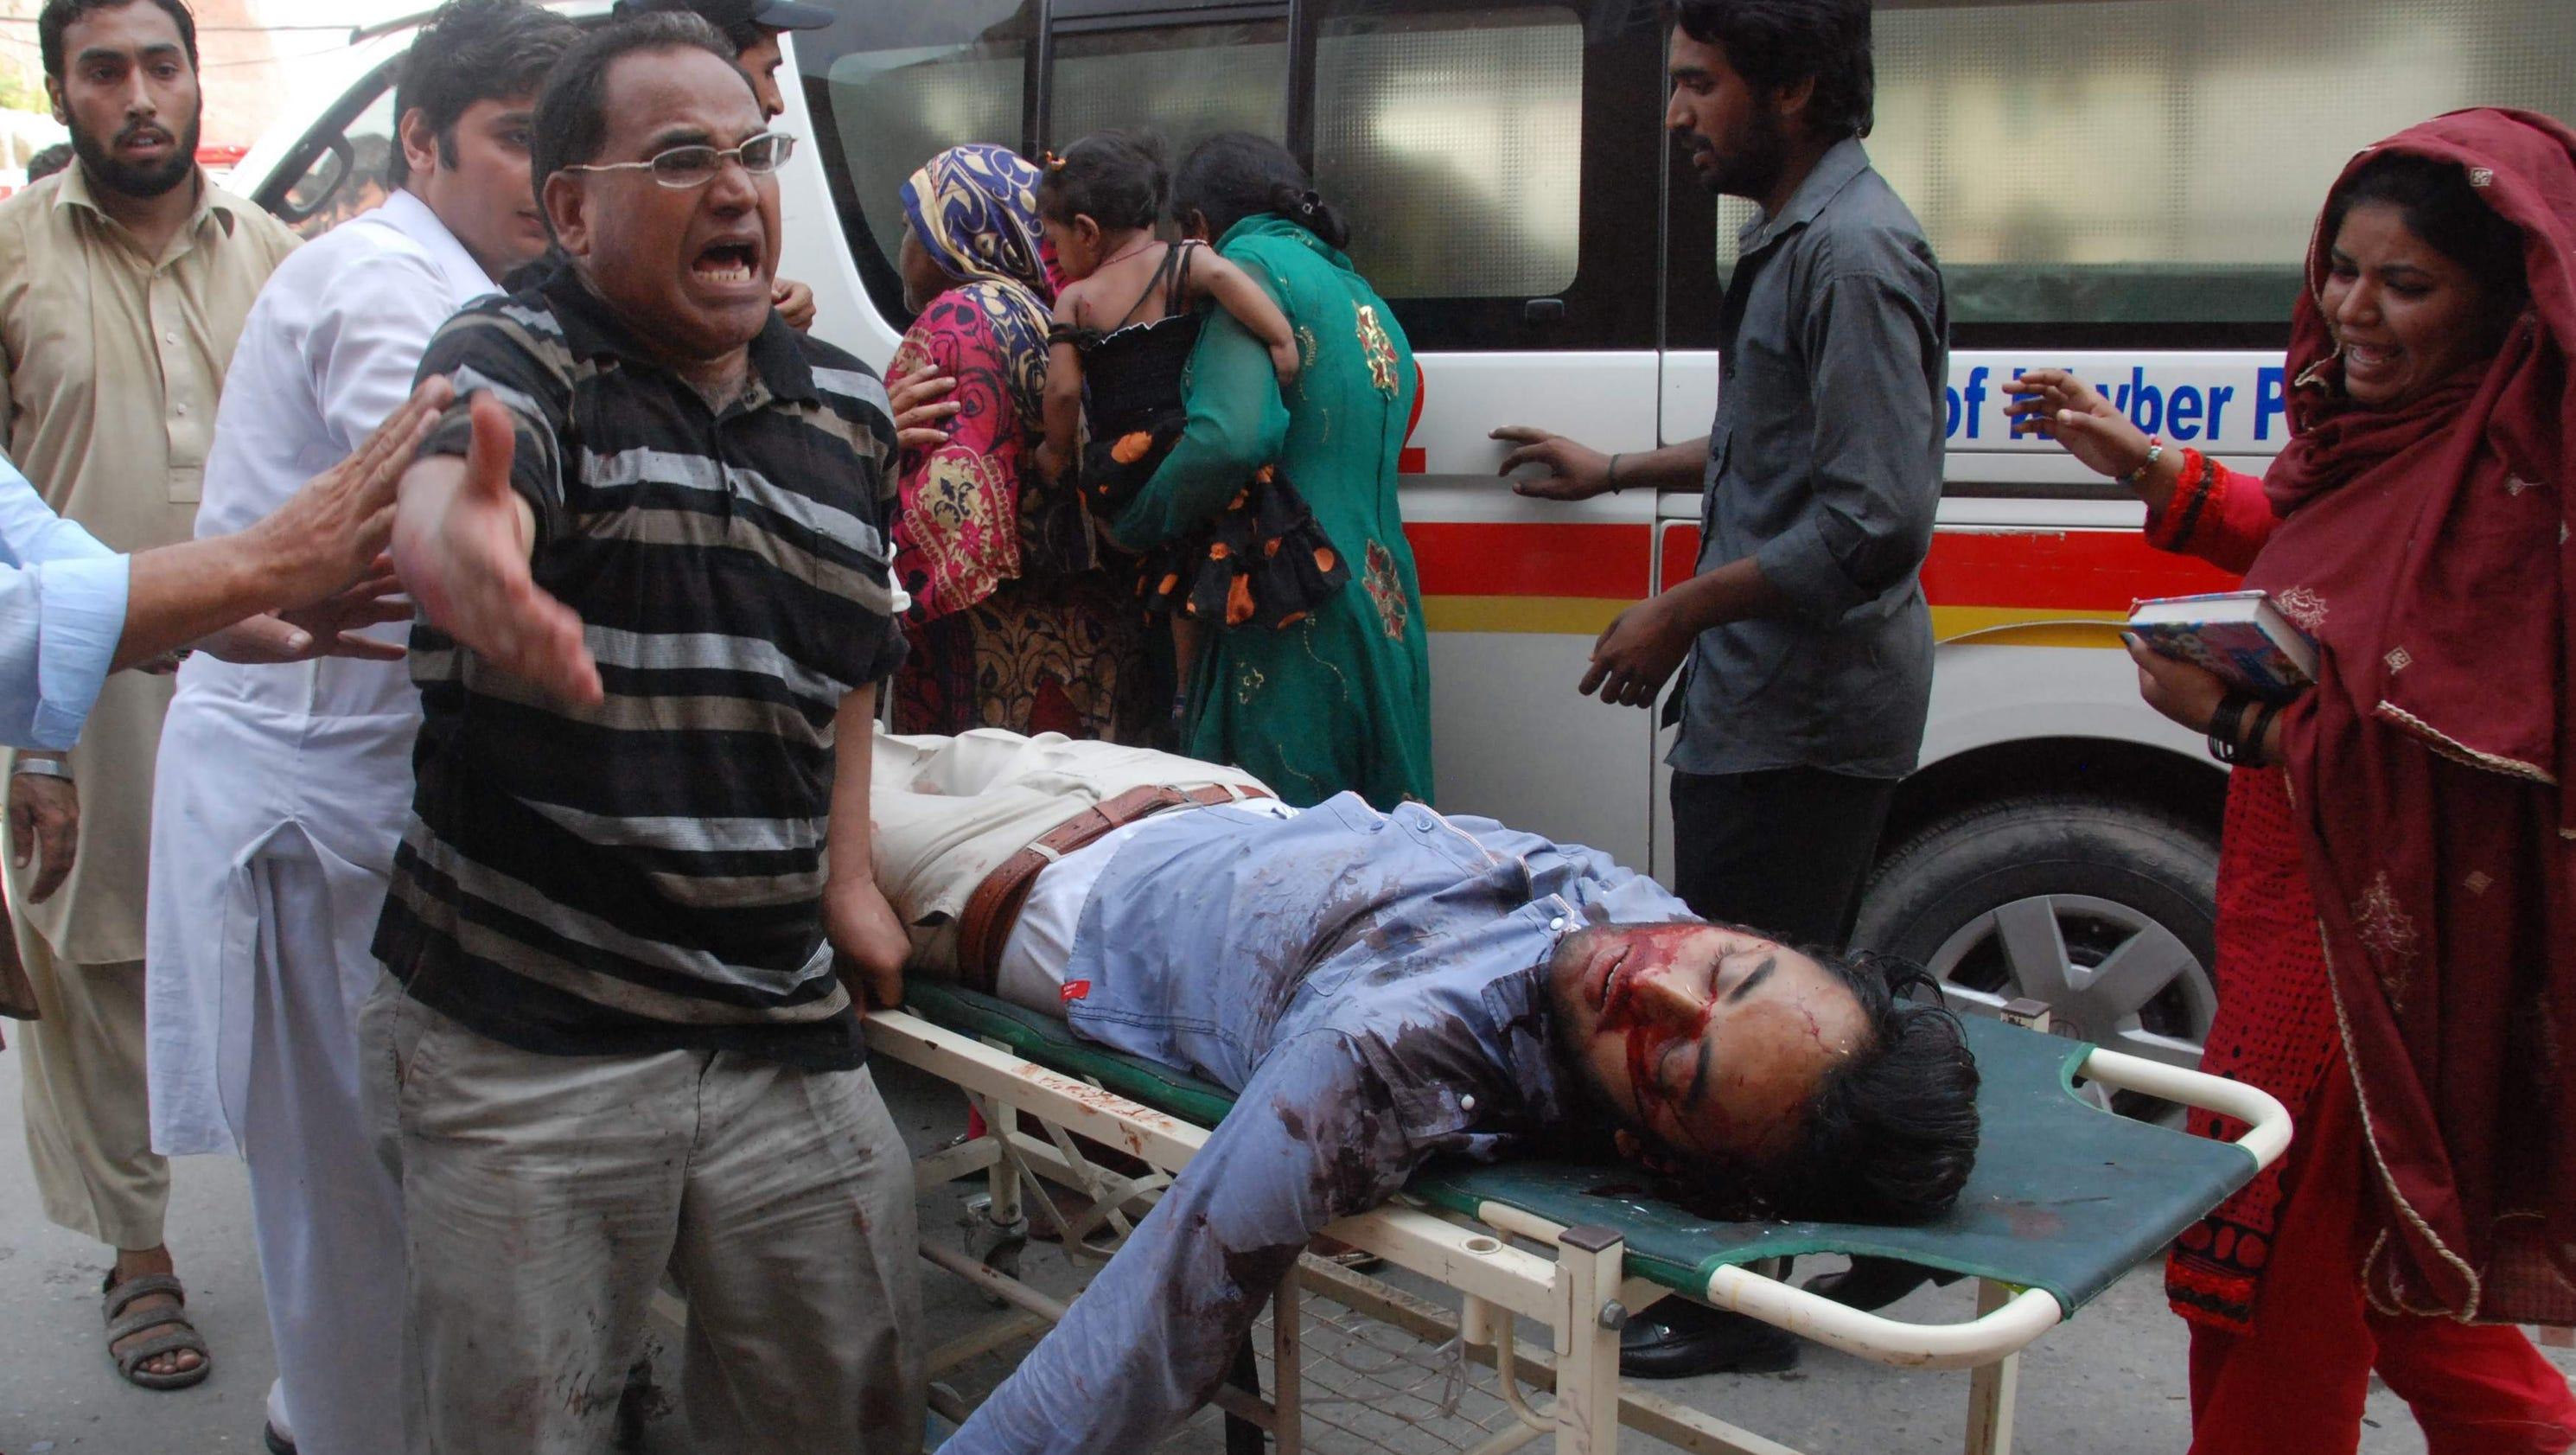 Taliban suicide bombing video